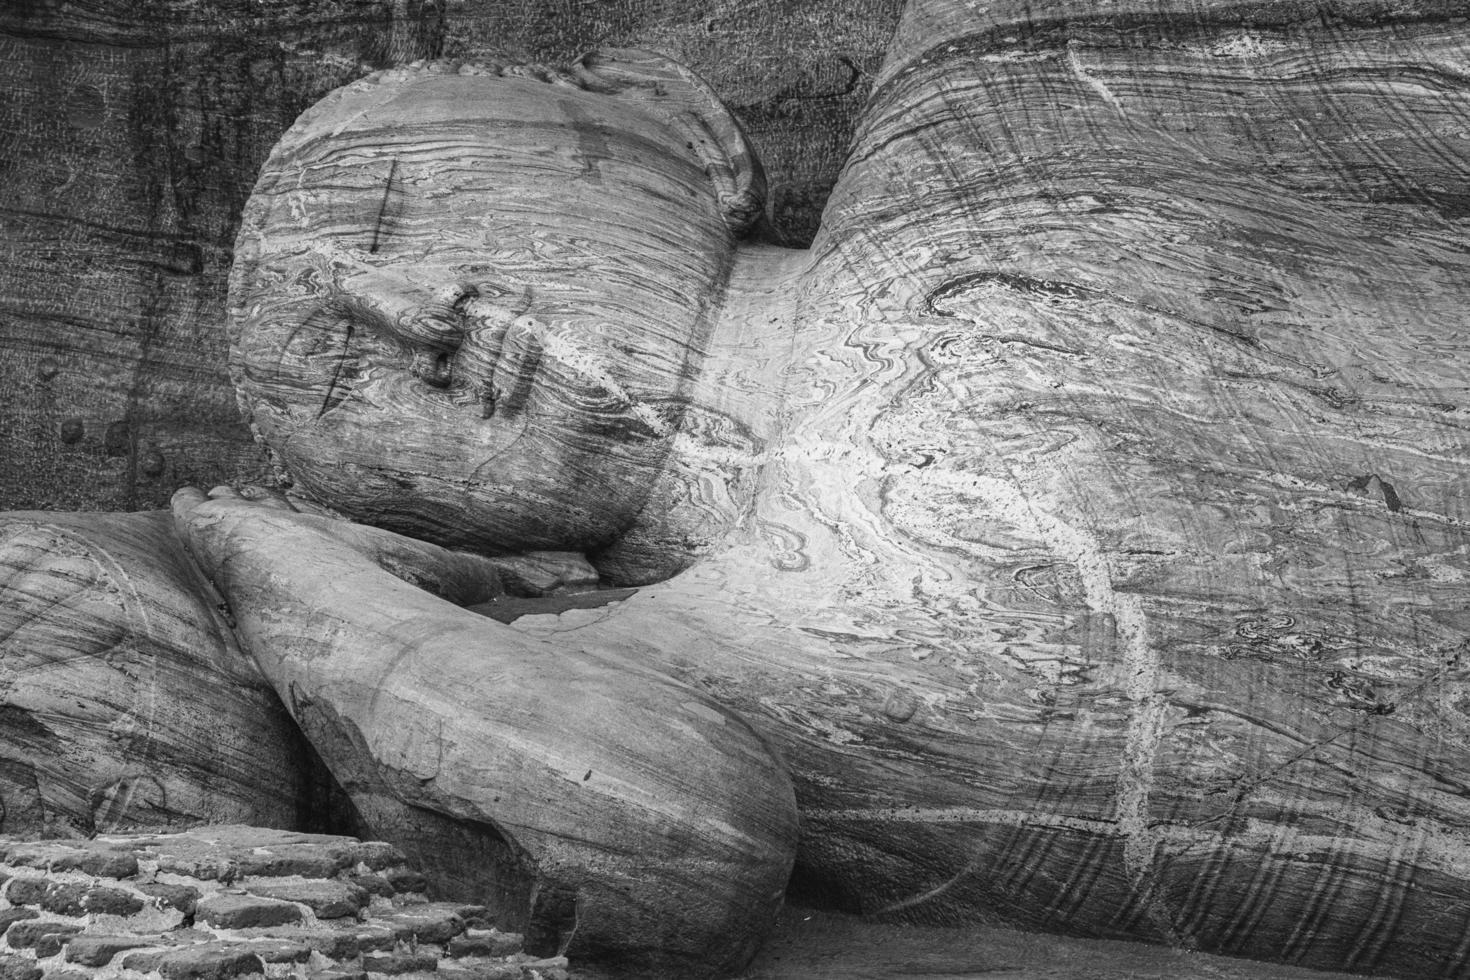 Statue de Bouddha en position Nirvana, grotte du Sri Lanka à Pidurangala photo